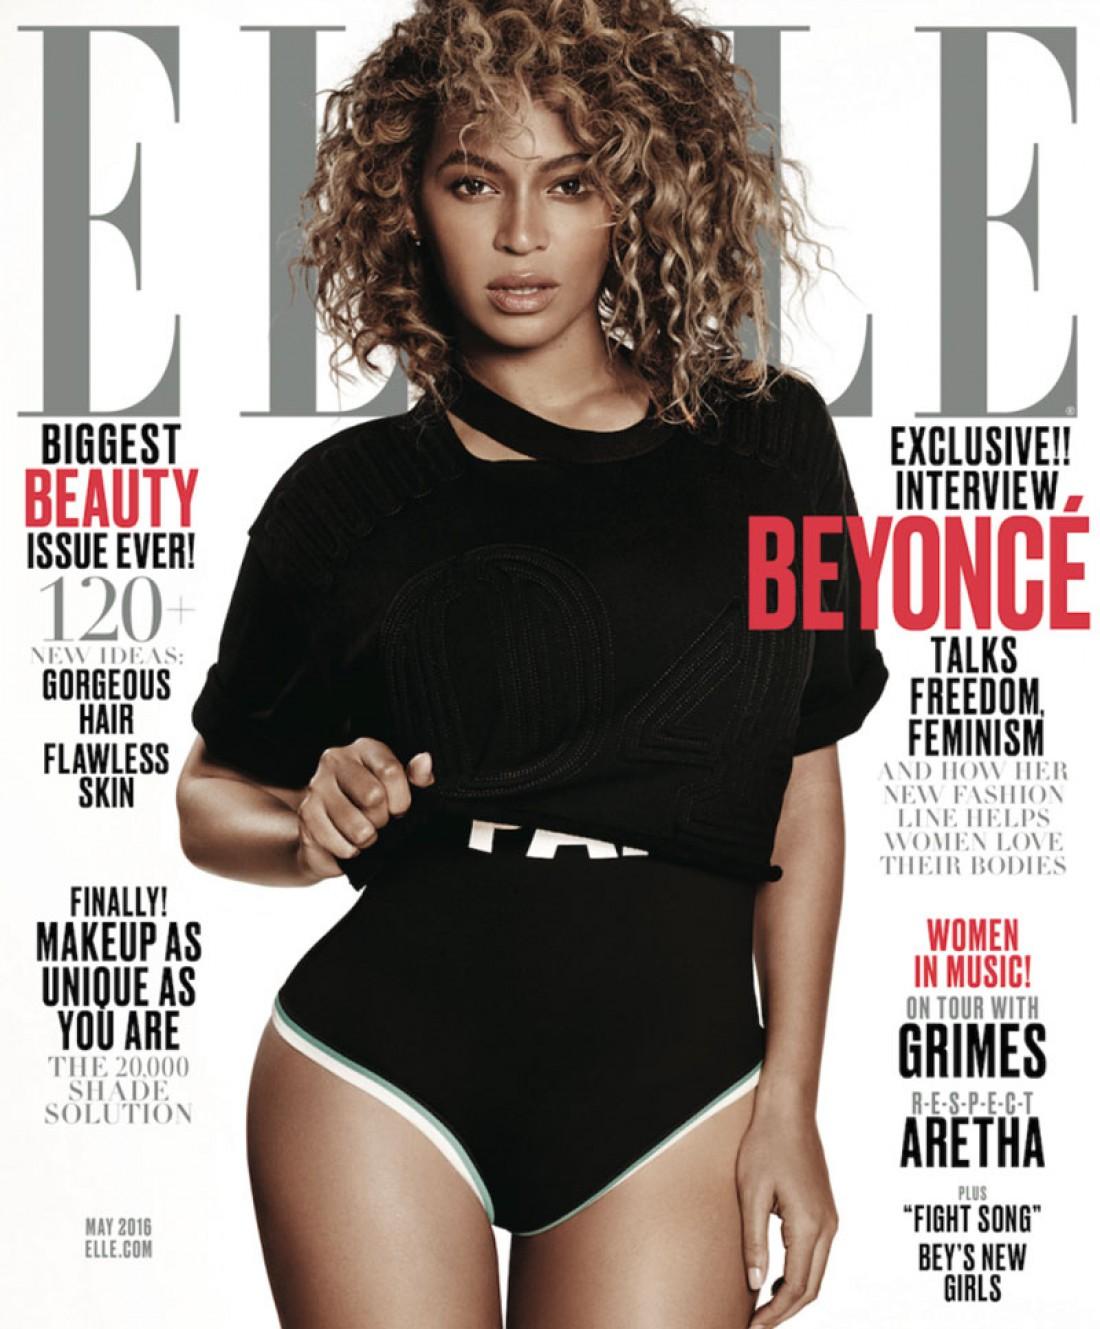 Певица Бейонсе на майской обложки Elle